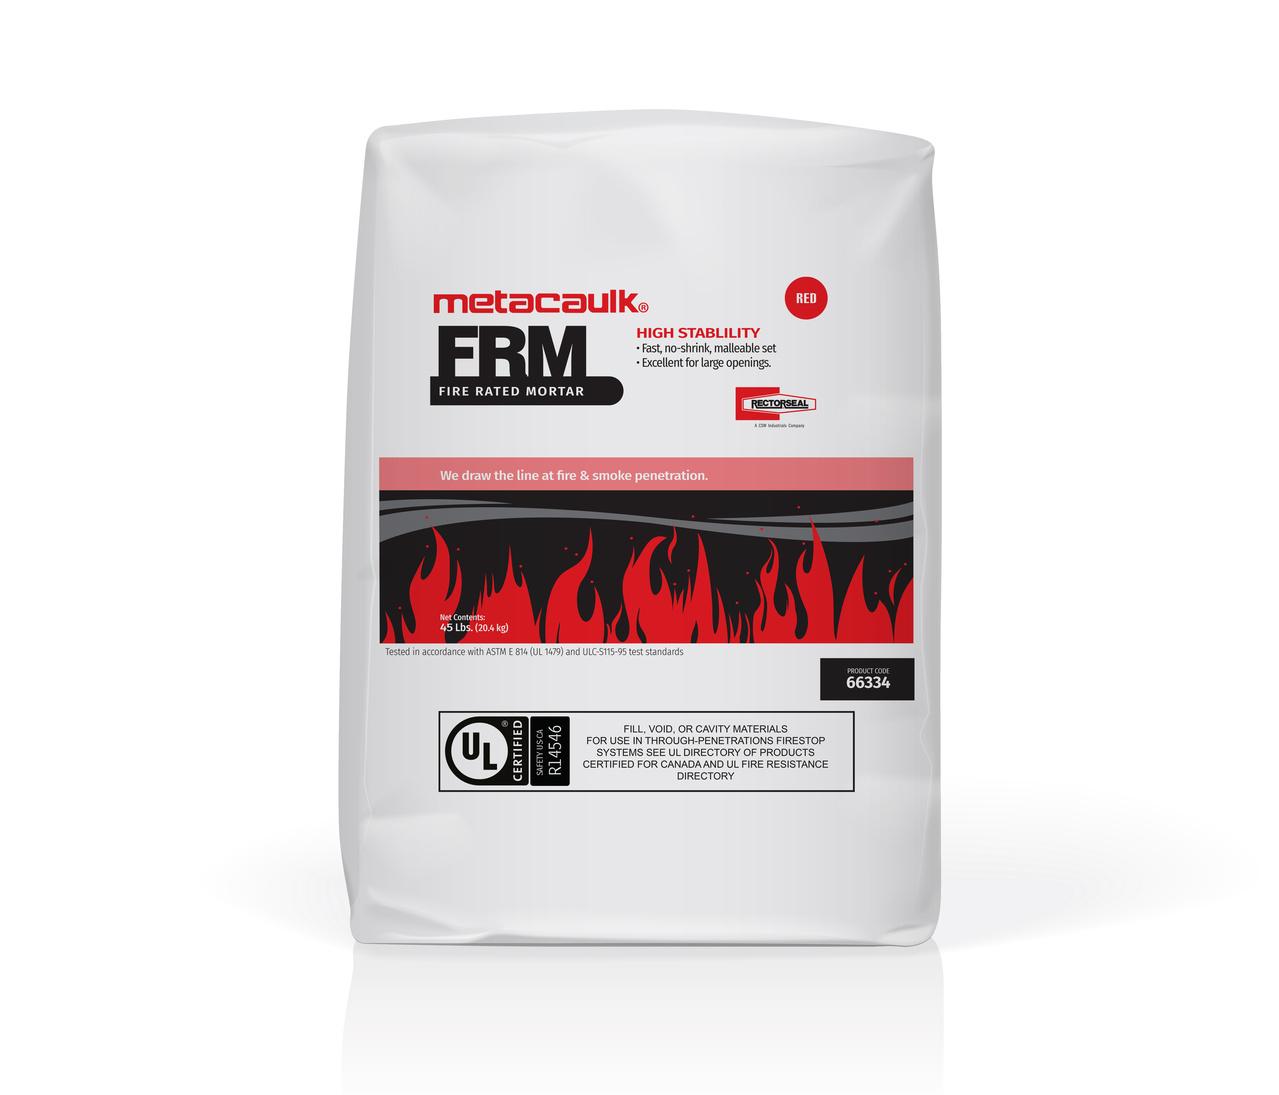 Metacaulk® FRM Fire Rated Mortar